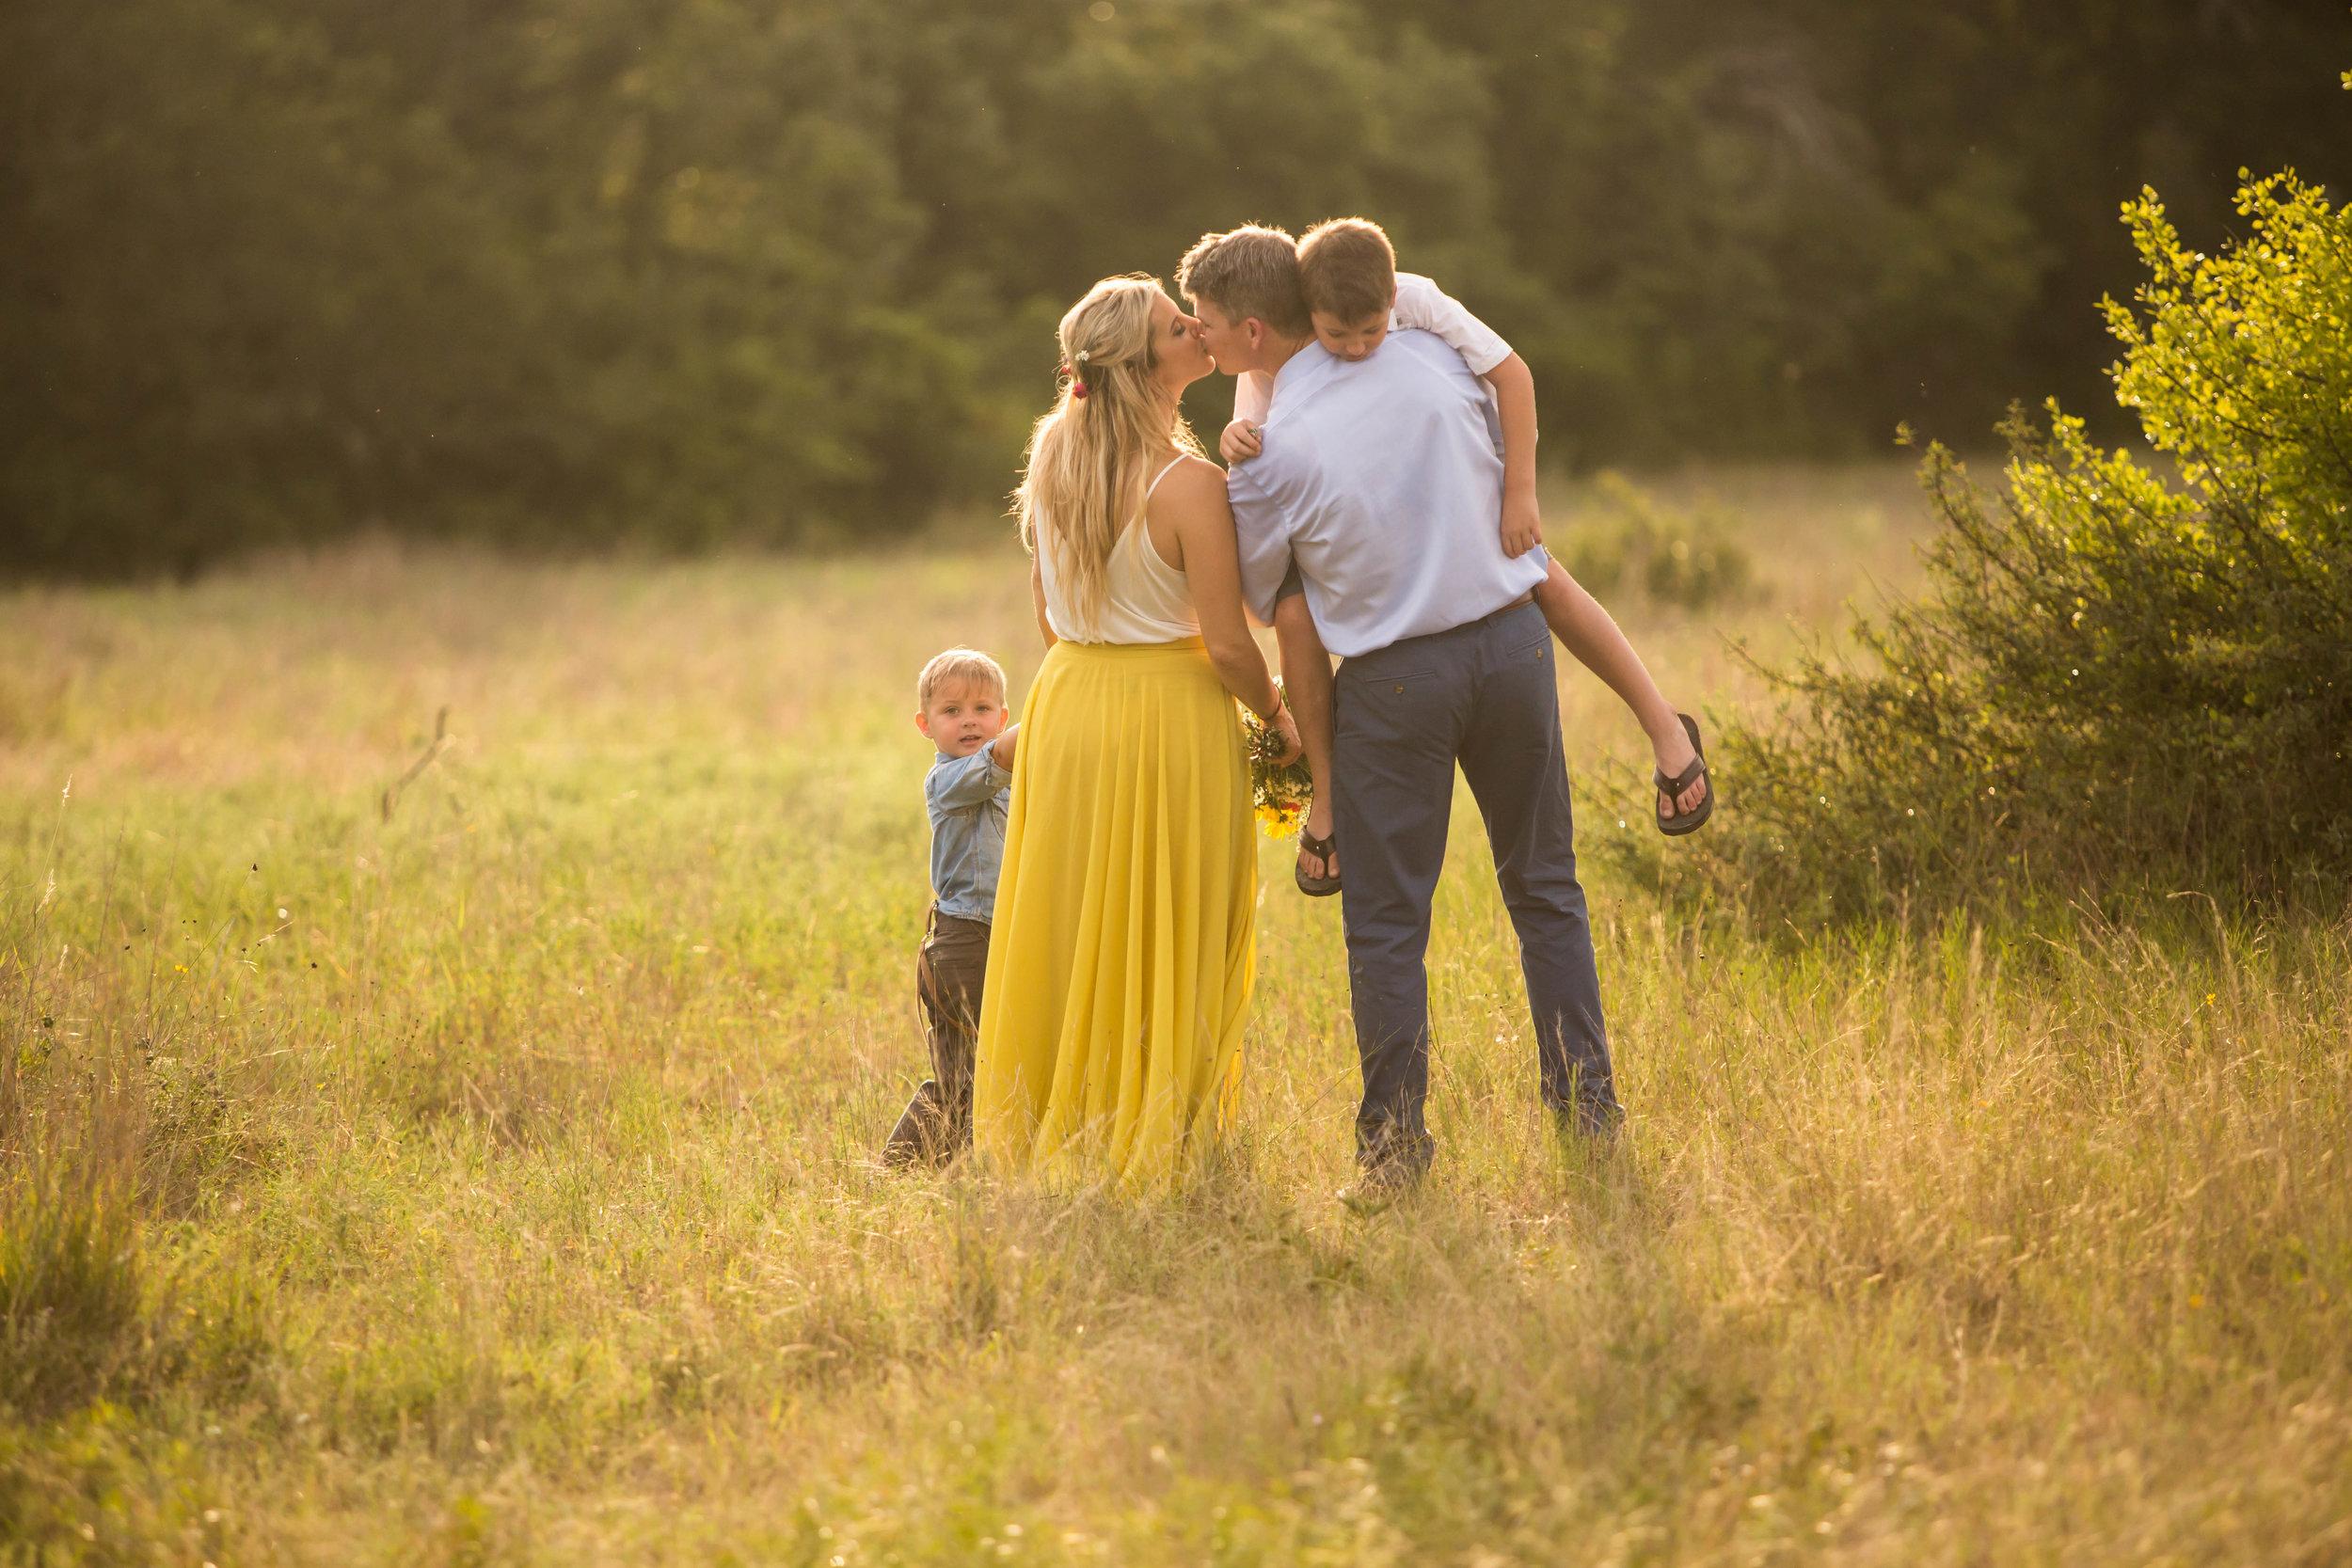 Marble_Falls_Milliorn_Family_Photographer_Jenna_Petty_16.jpg